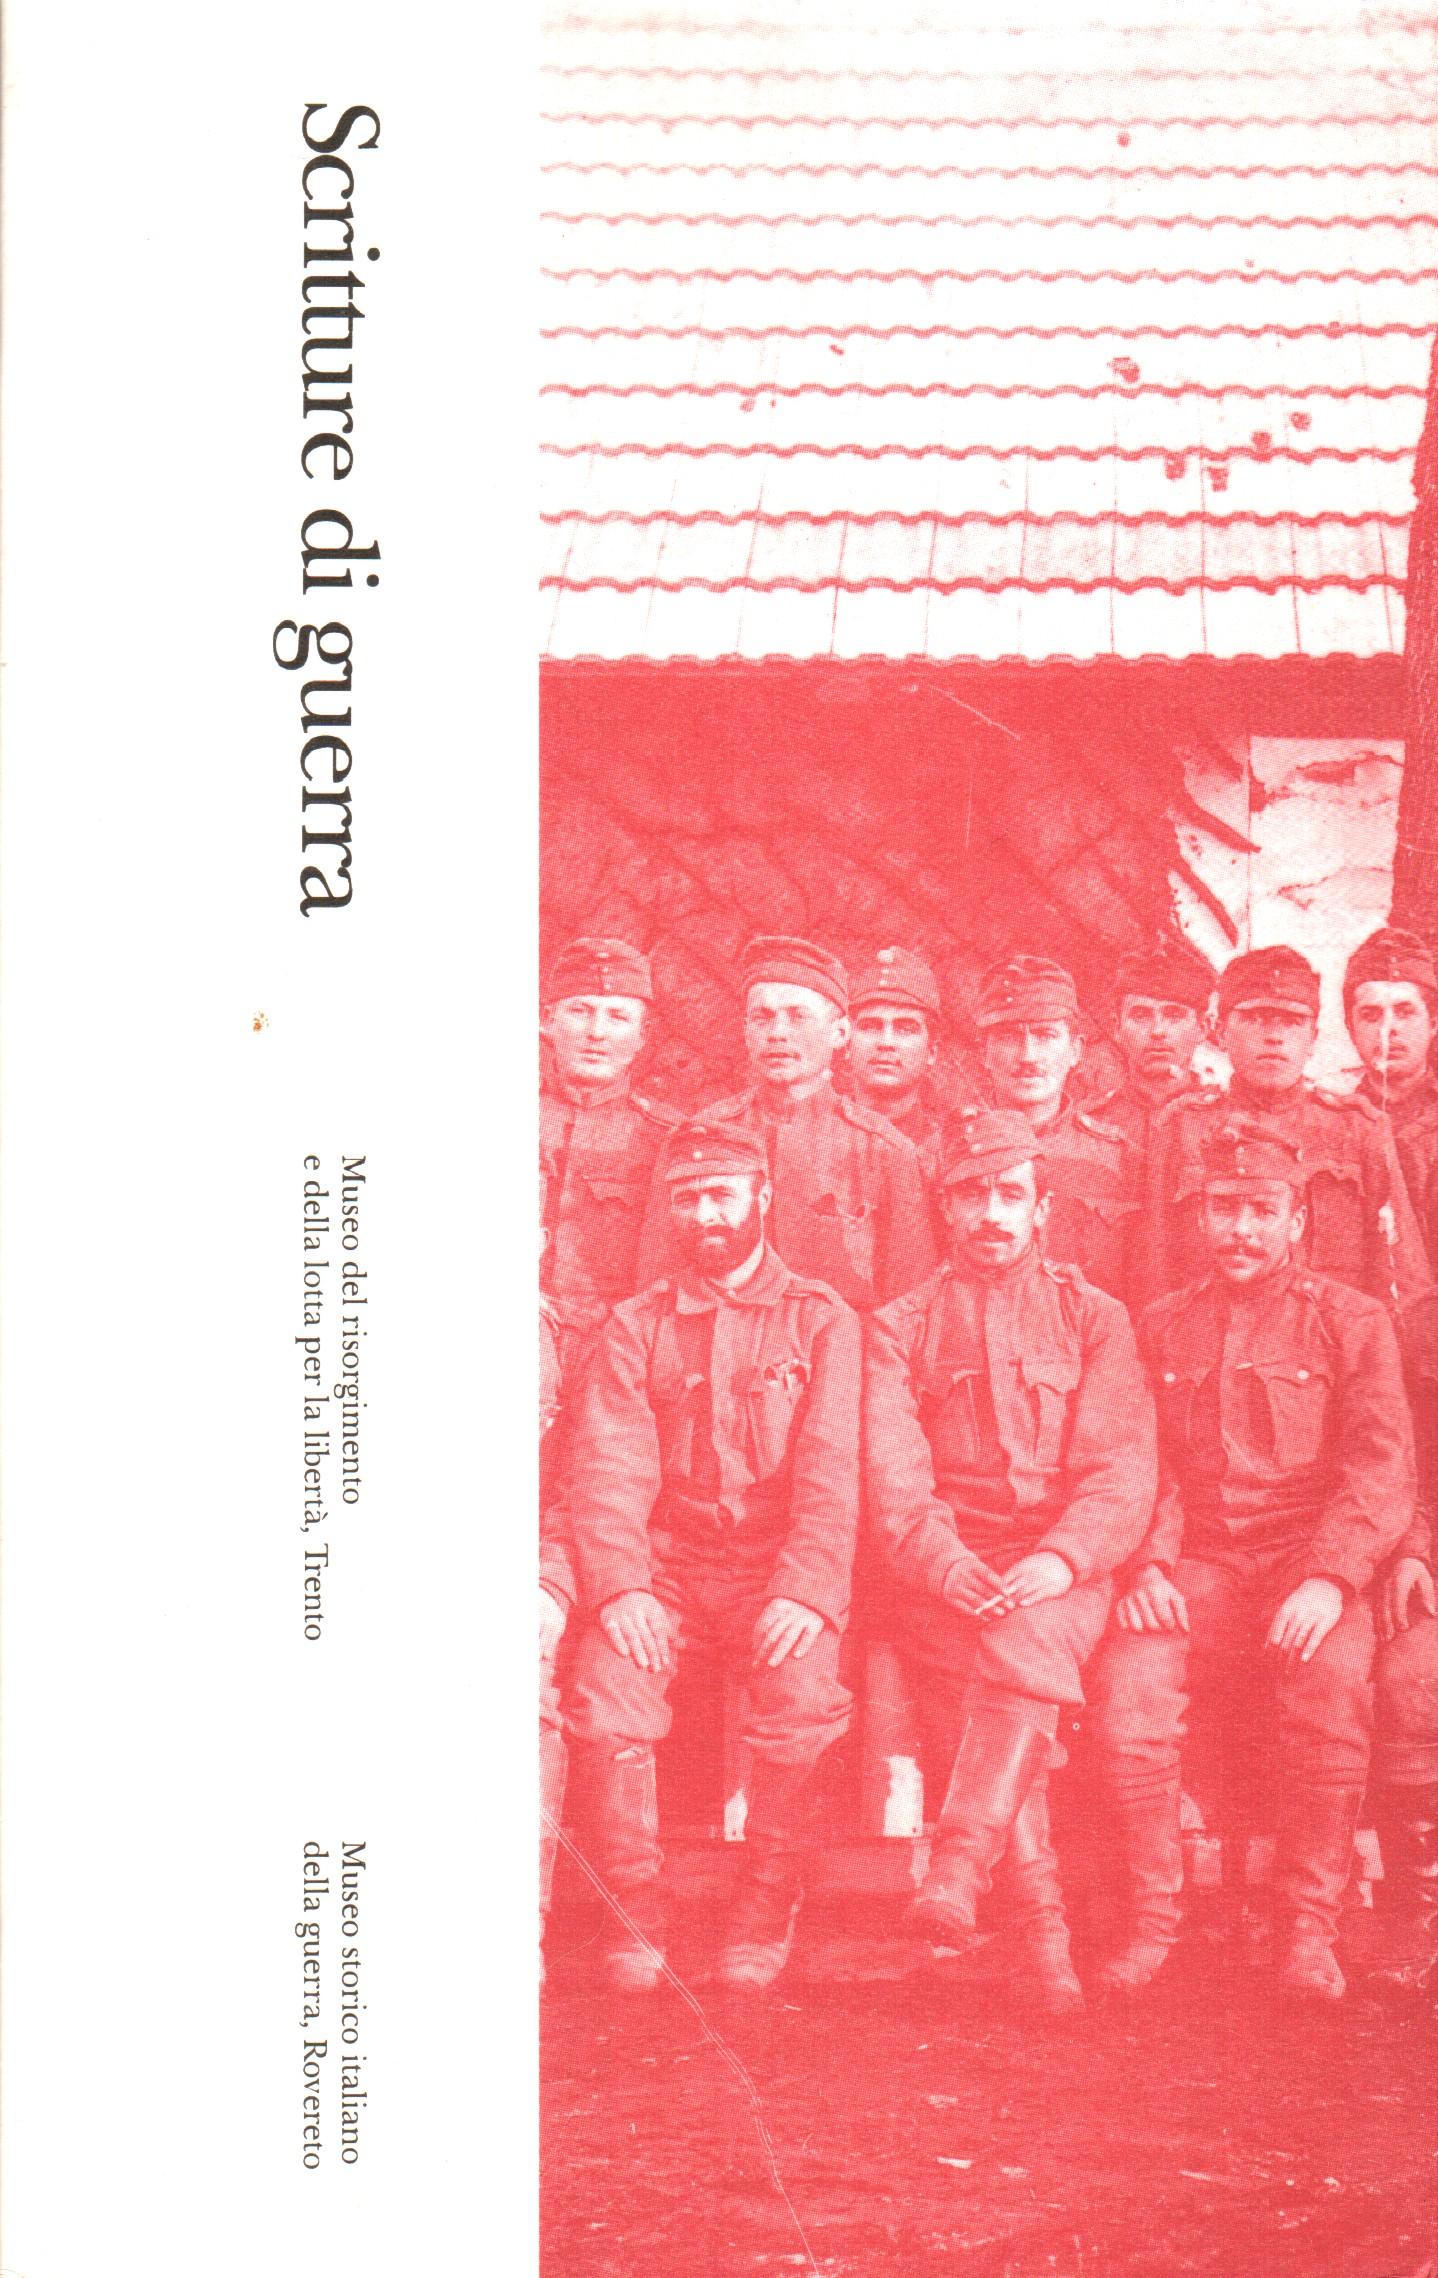 Riccardo Malesardi, Giuseppe Masera, Rosina Fedrozzi Masera, Evaristo Masera, Mario Raffaelli (diari della prima guerra mondiale)